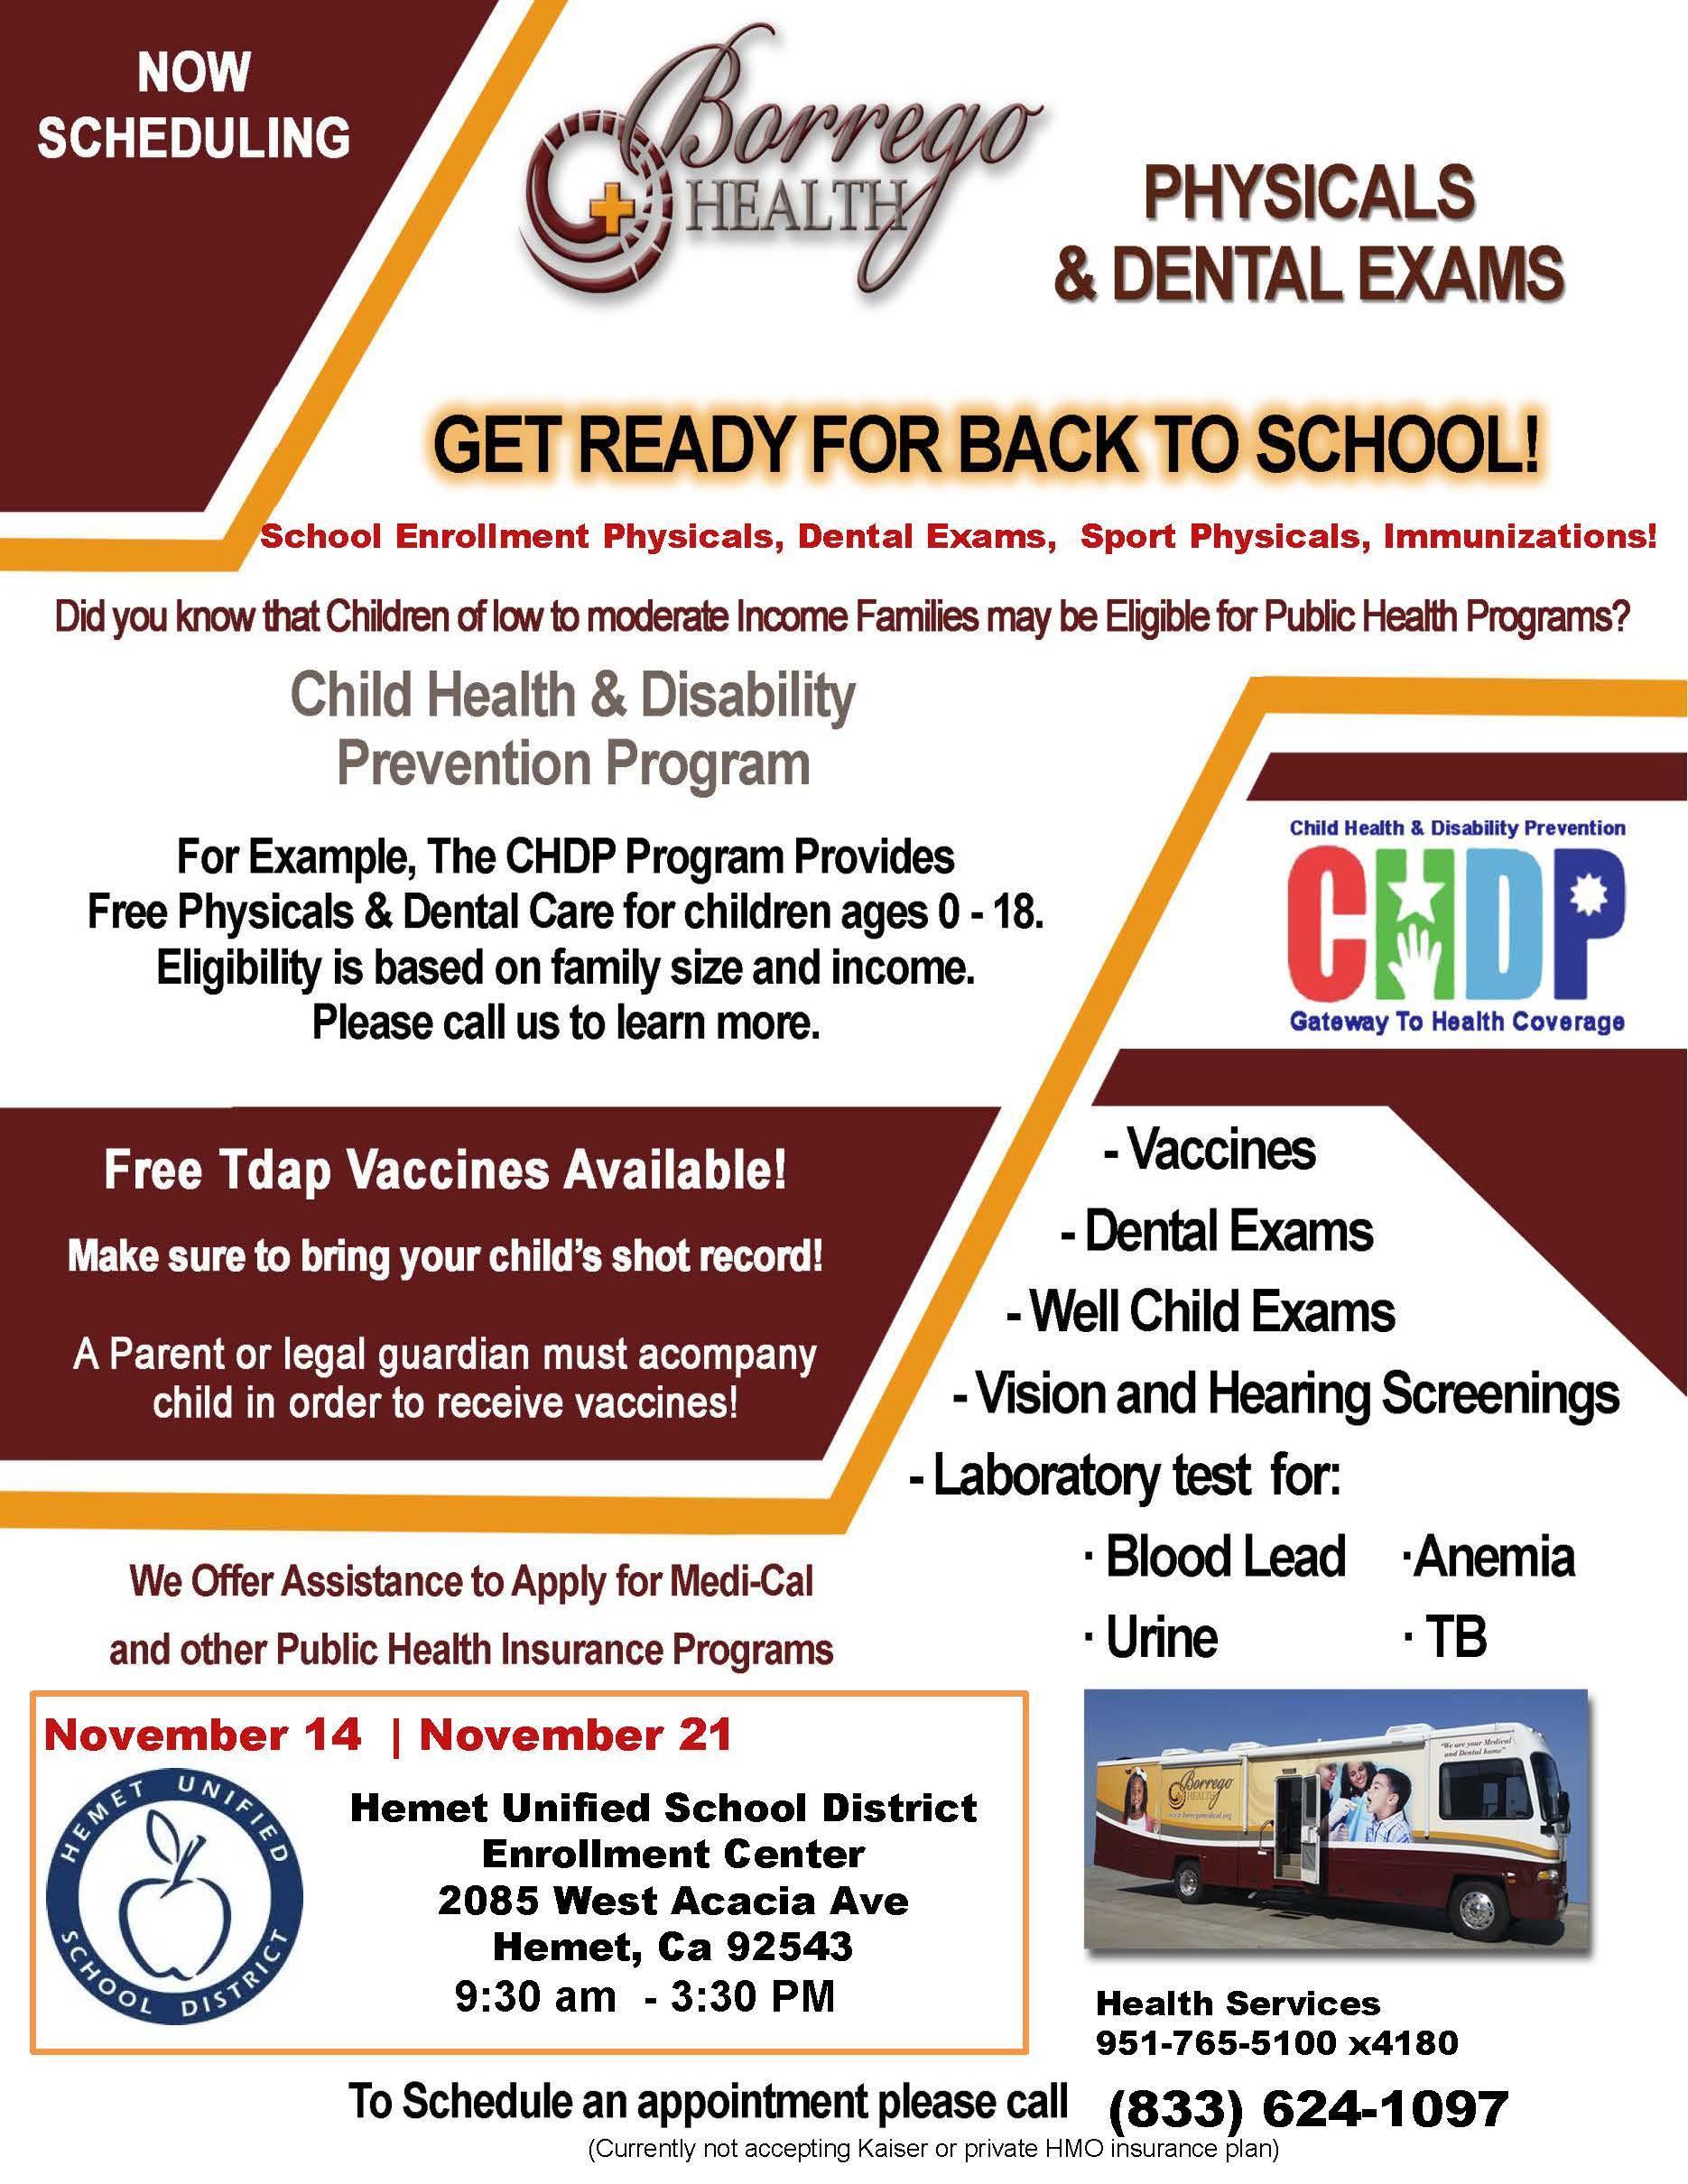 Borrego Clinic-Physicals, Sports Physicals, Immunizations, and Dental Clinics. November 14th & 21st @ Hemet Unified Enrollment Center.